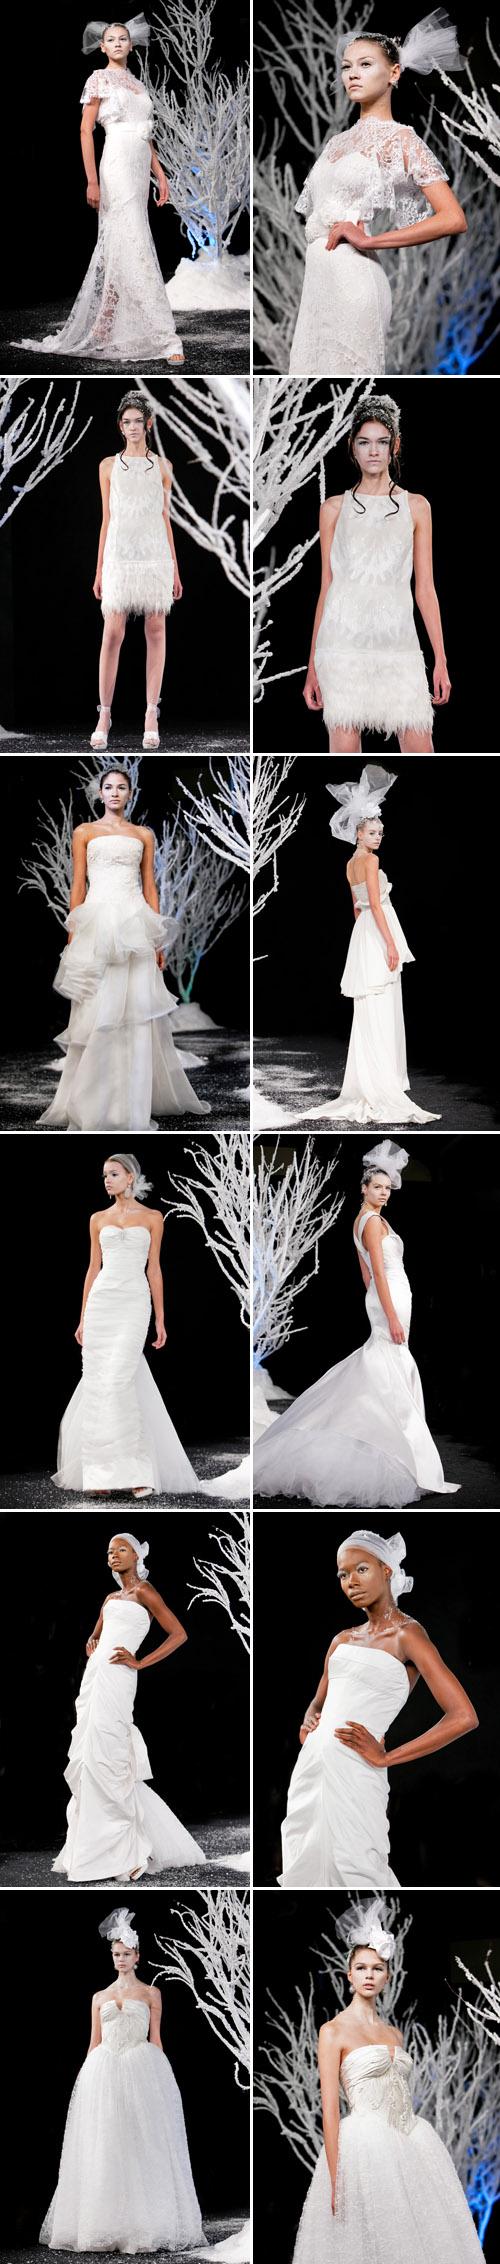 Douglas Hannant Fall 2011 wedding dress collection from NY Bridal Market, photos by John and Jospeh Photography